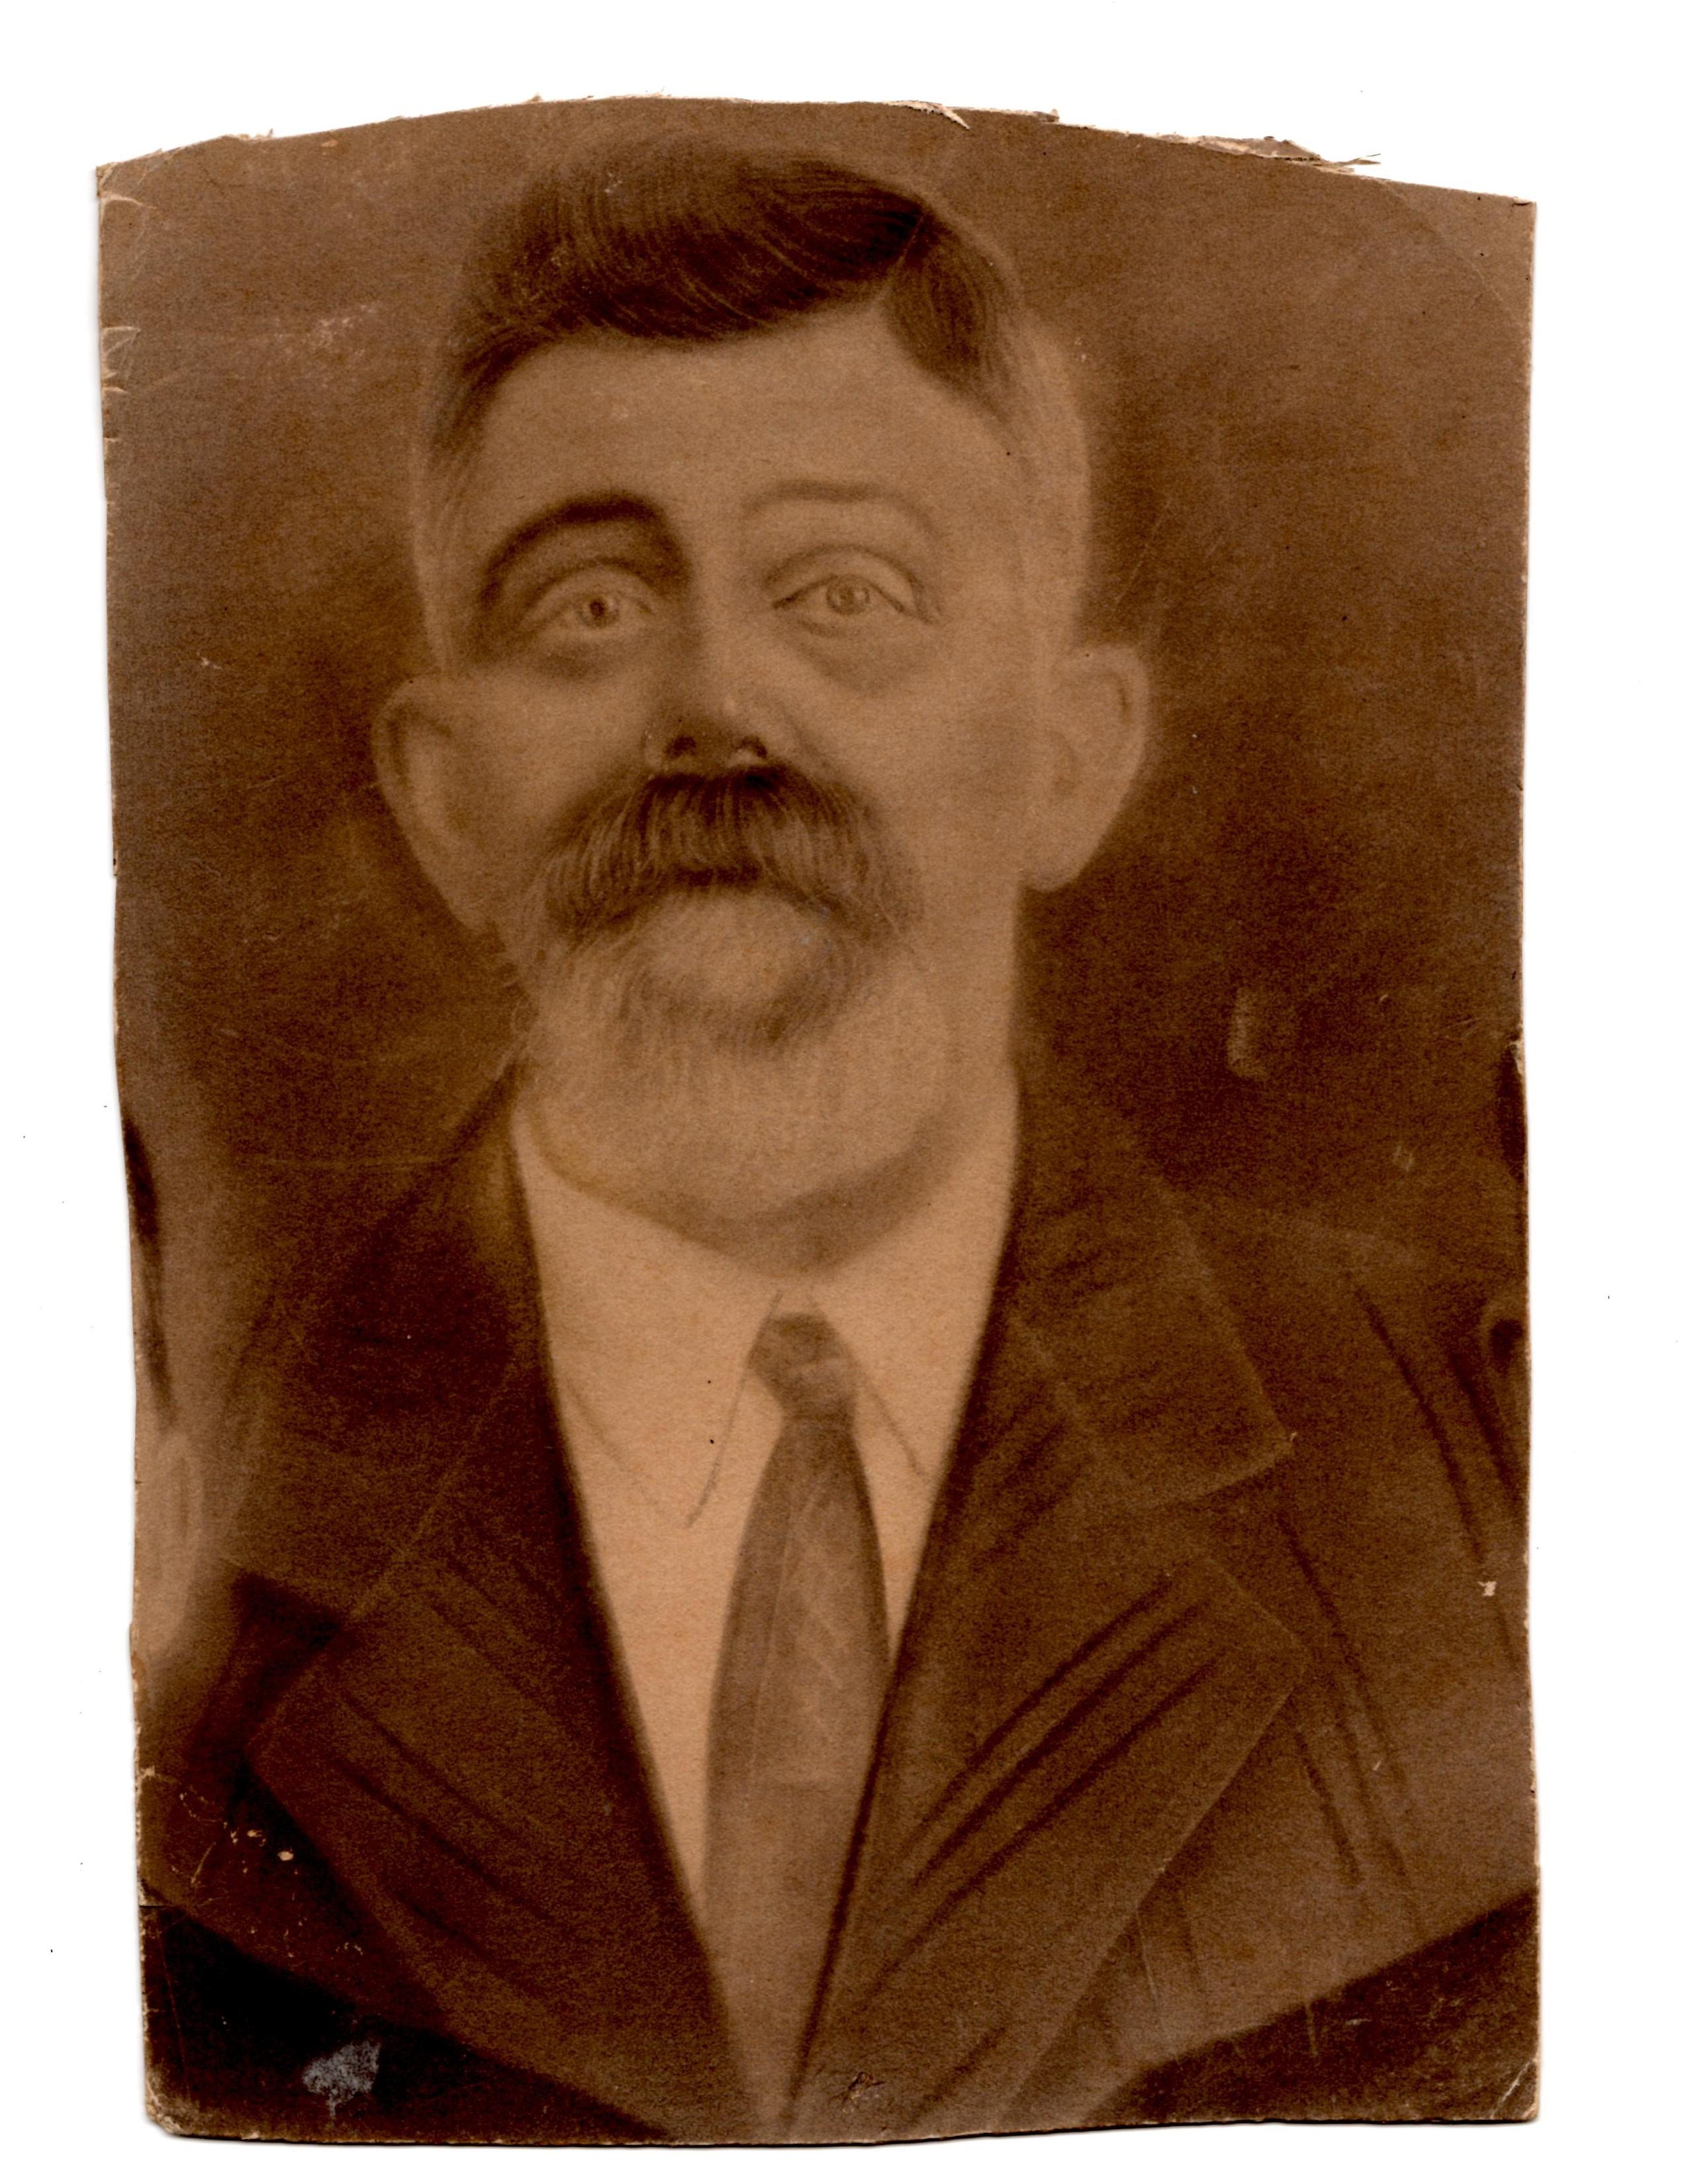 Henry Scaggs